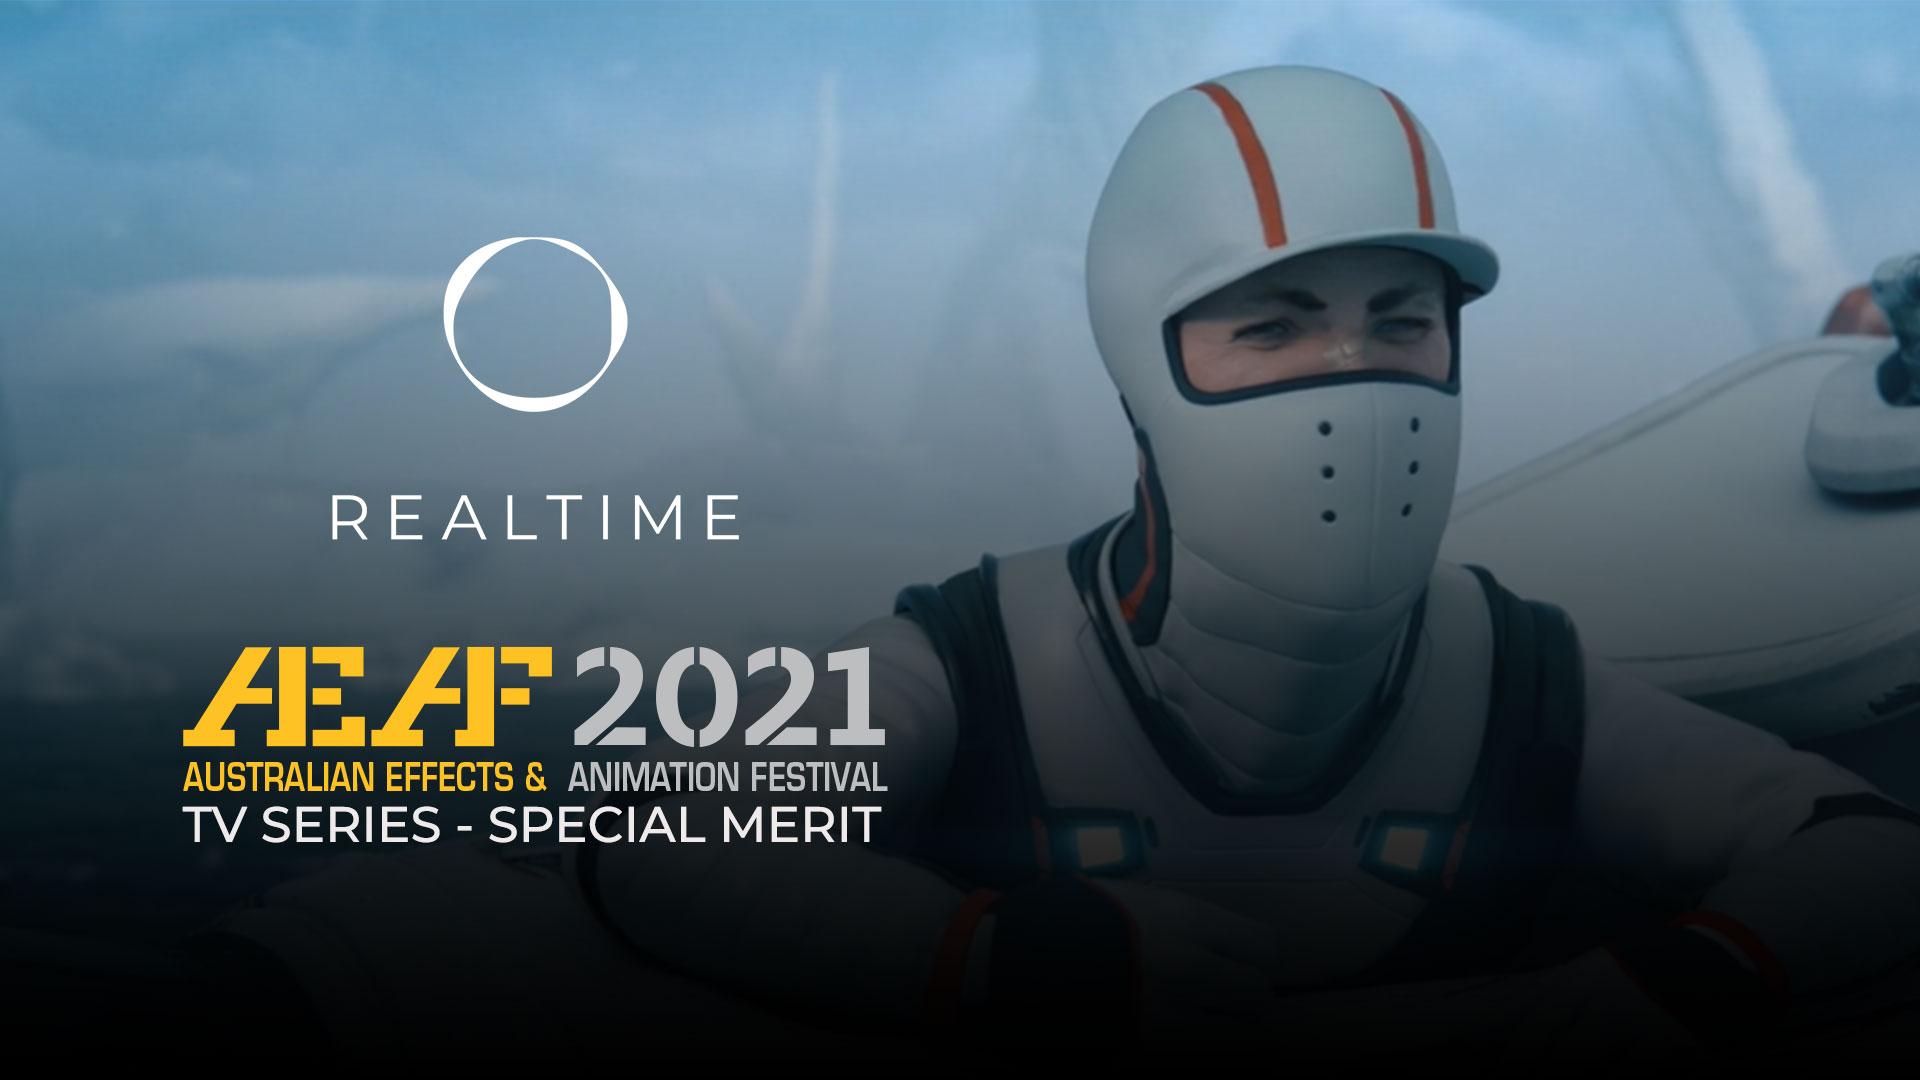 Subnautica: Below Zero Trailer lands Special Merit at the AEAF Awards